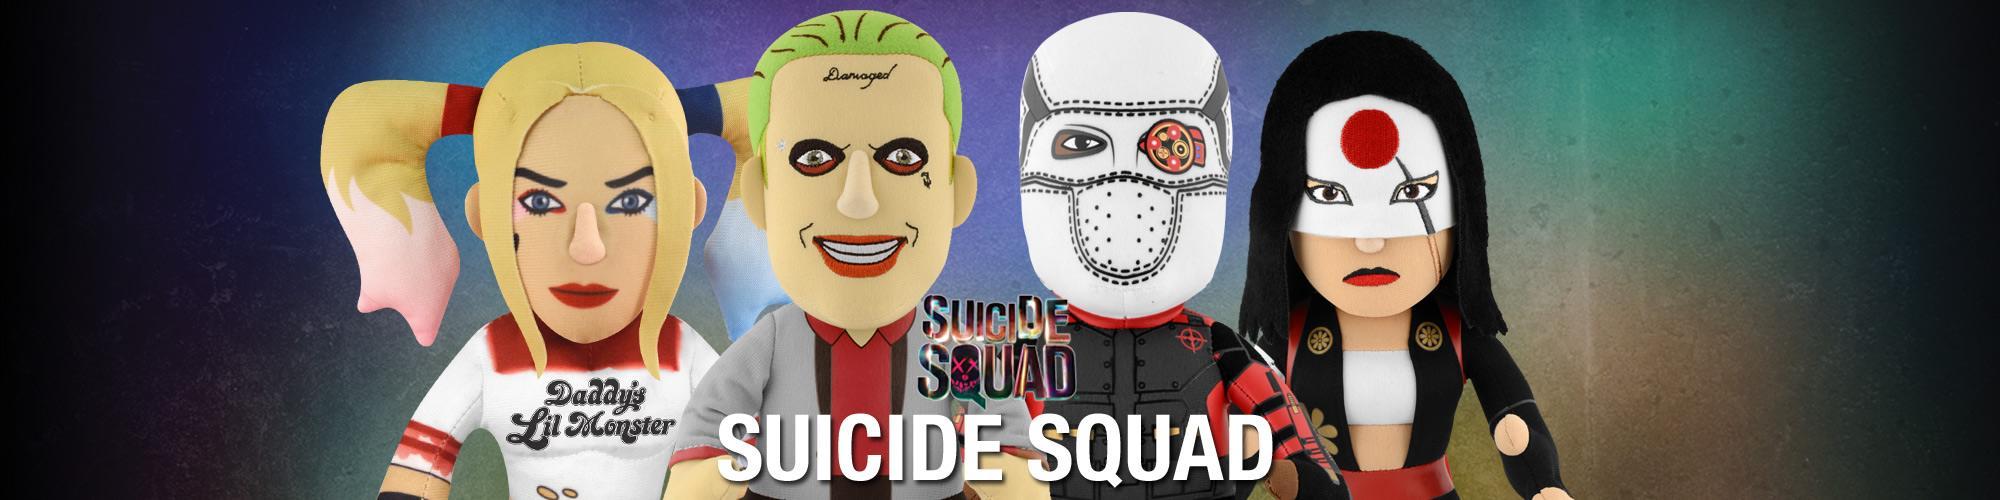 bc-suicide-squad-banner